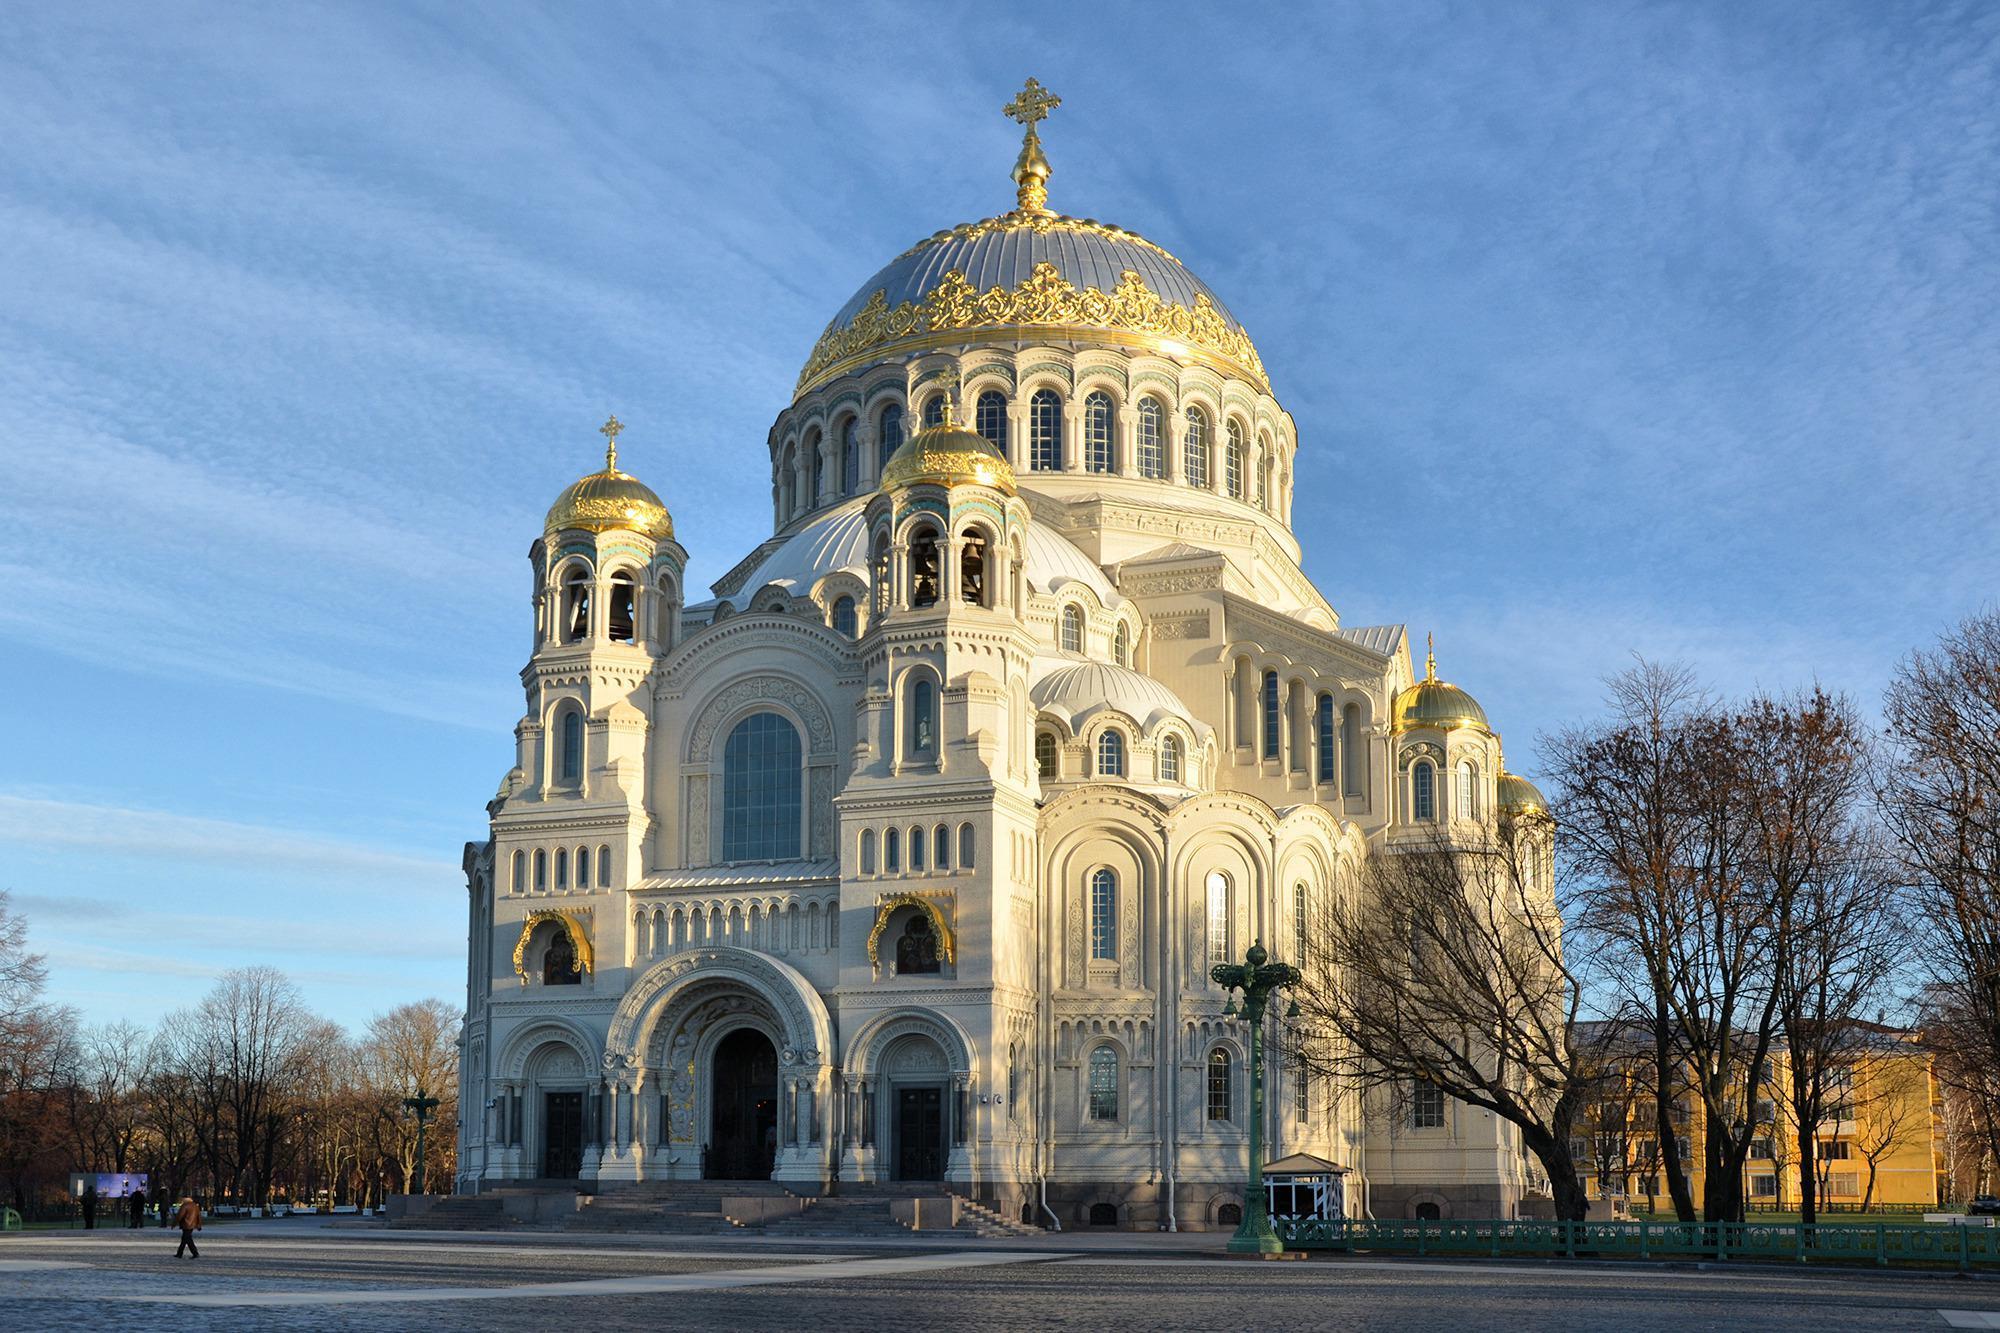 Saint Nicholas Naval Cathedral in Kronstadt, Kronstadt, Russia